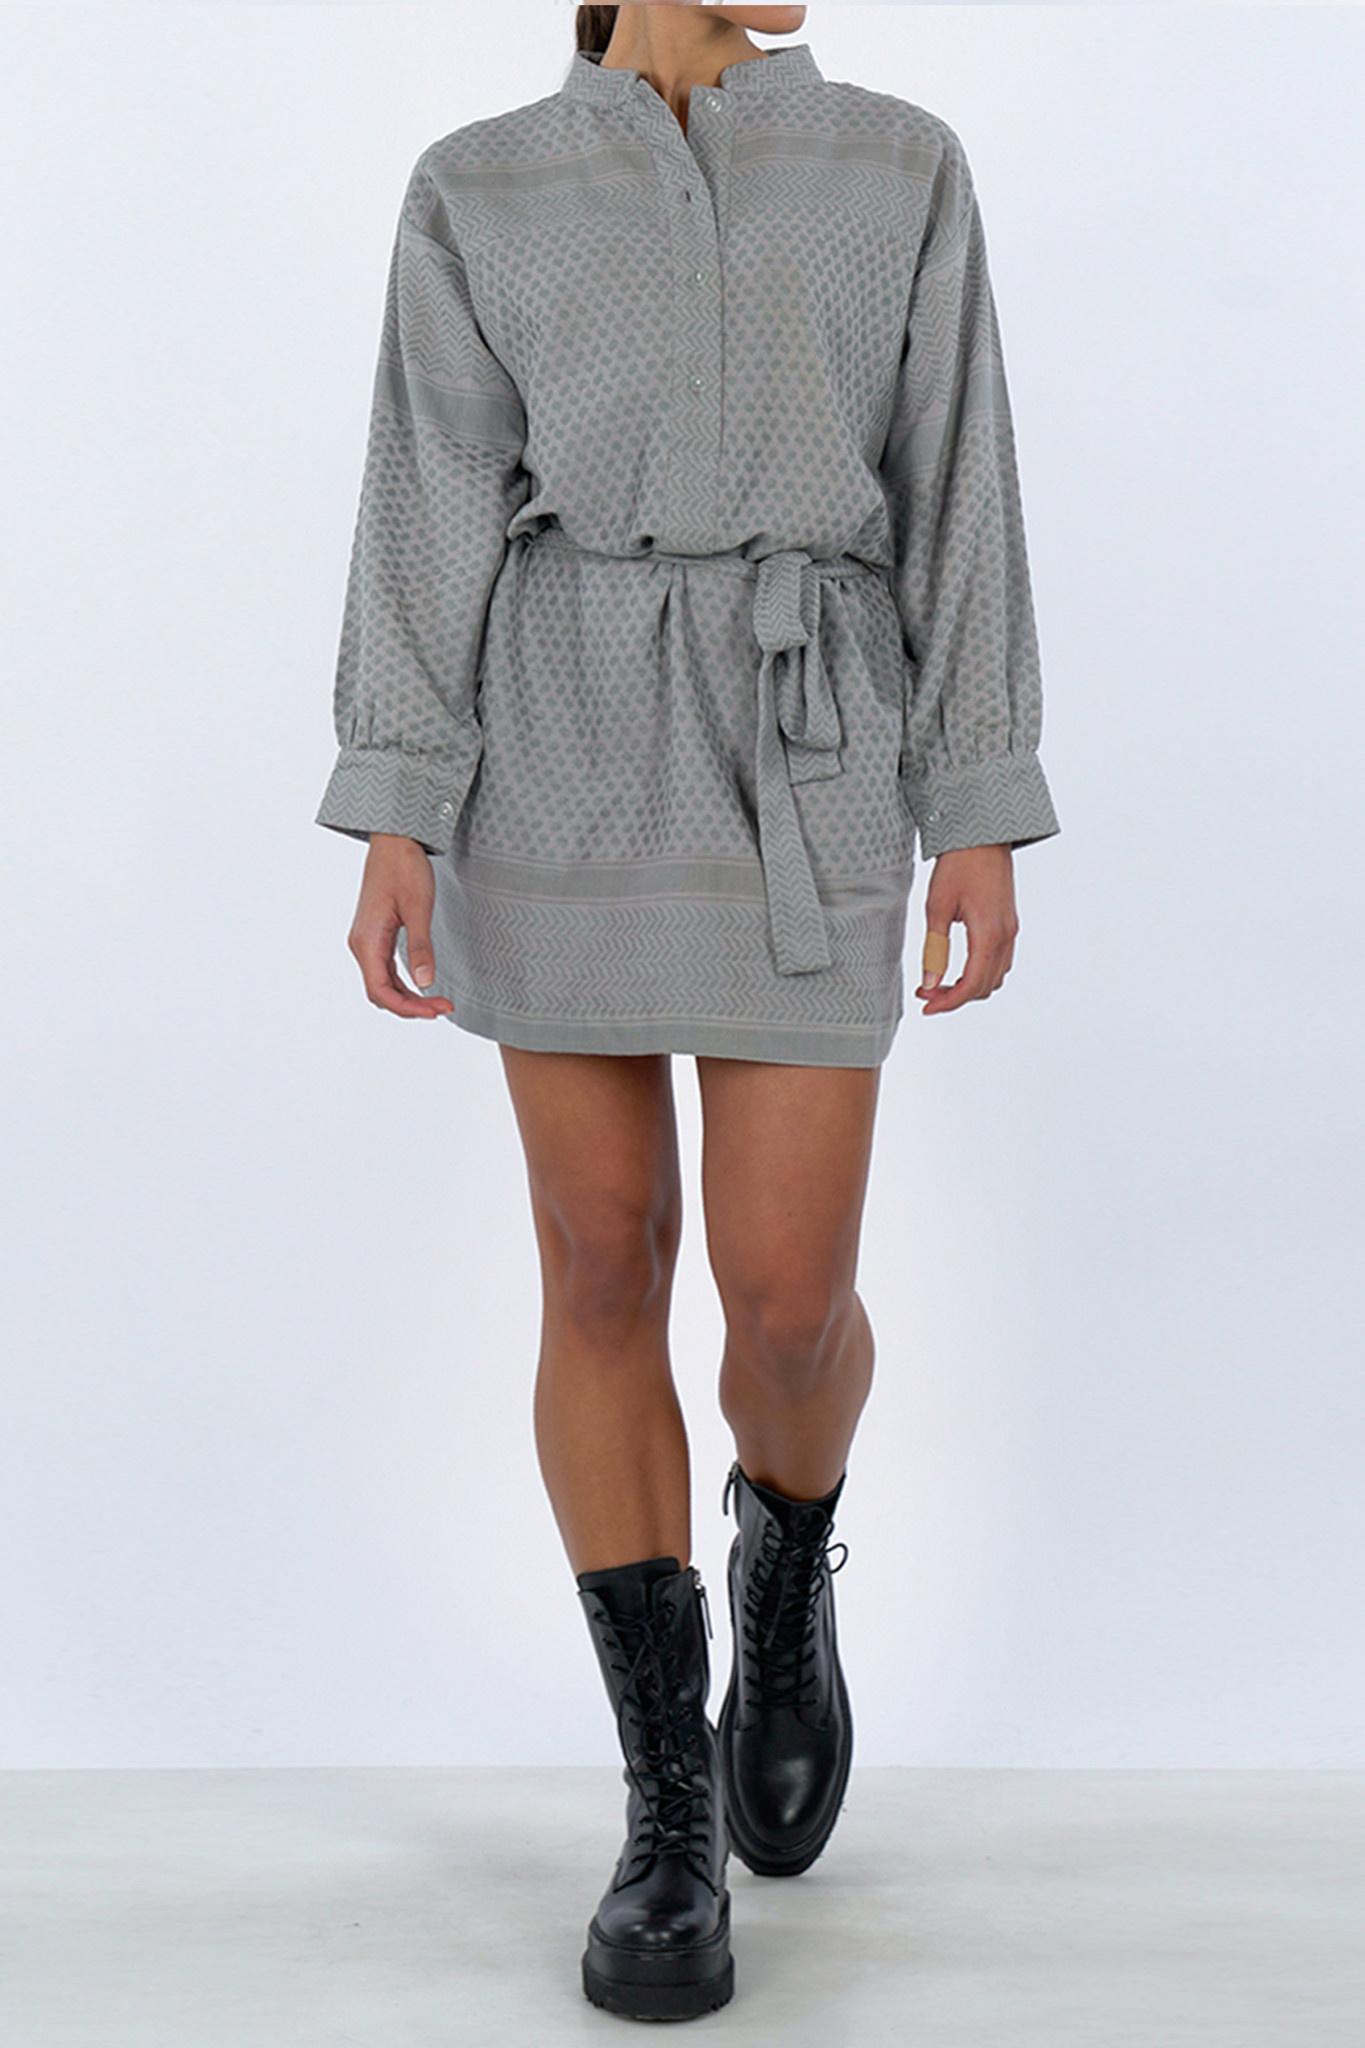 Leila K Dress - Grey-1